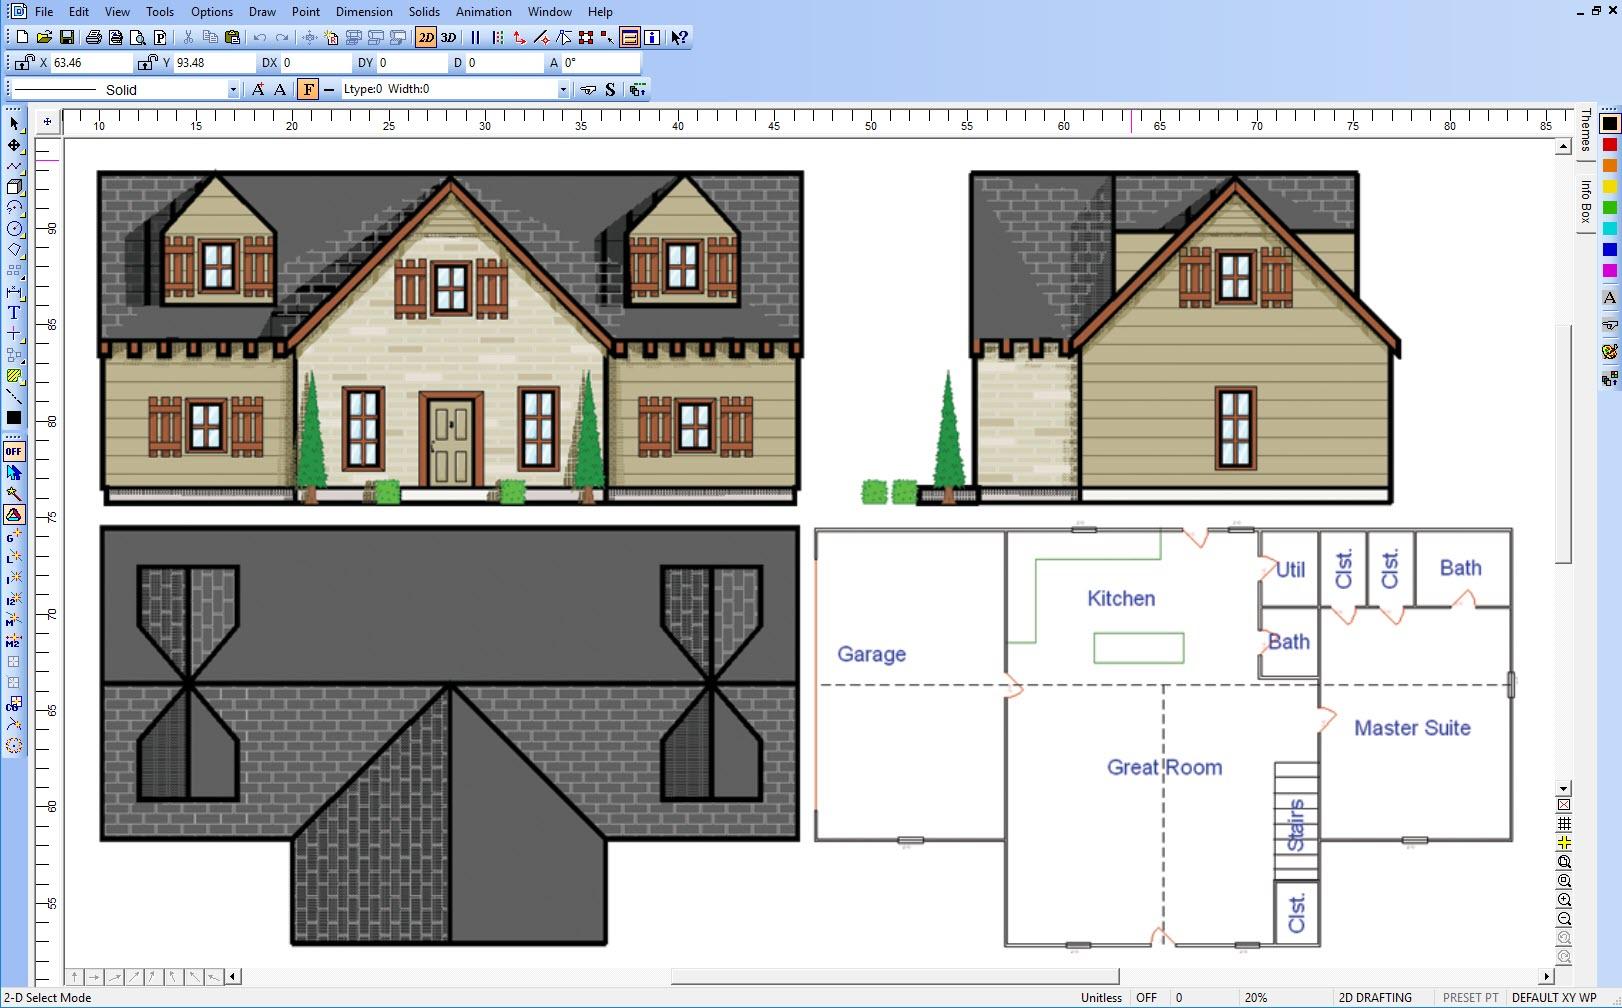 DesignCAD Demo - Floorplan Designing